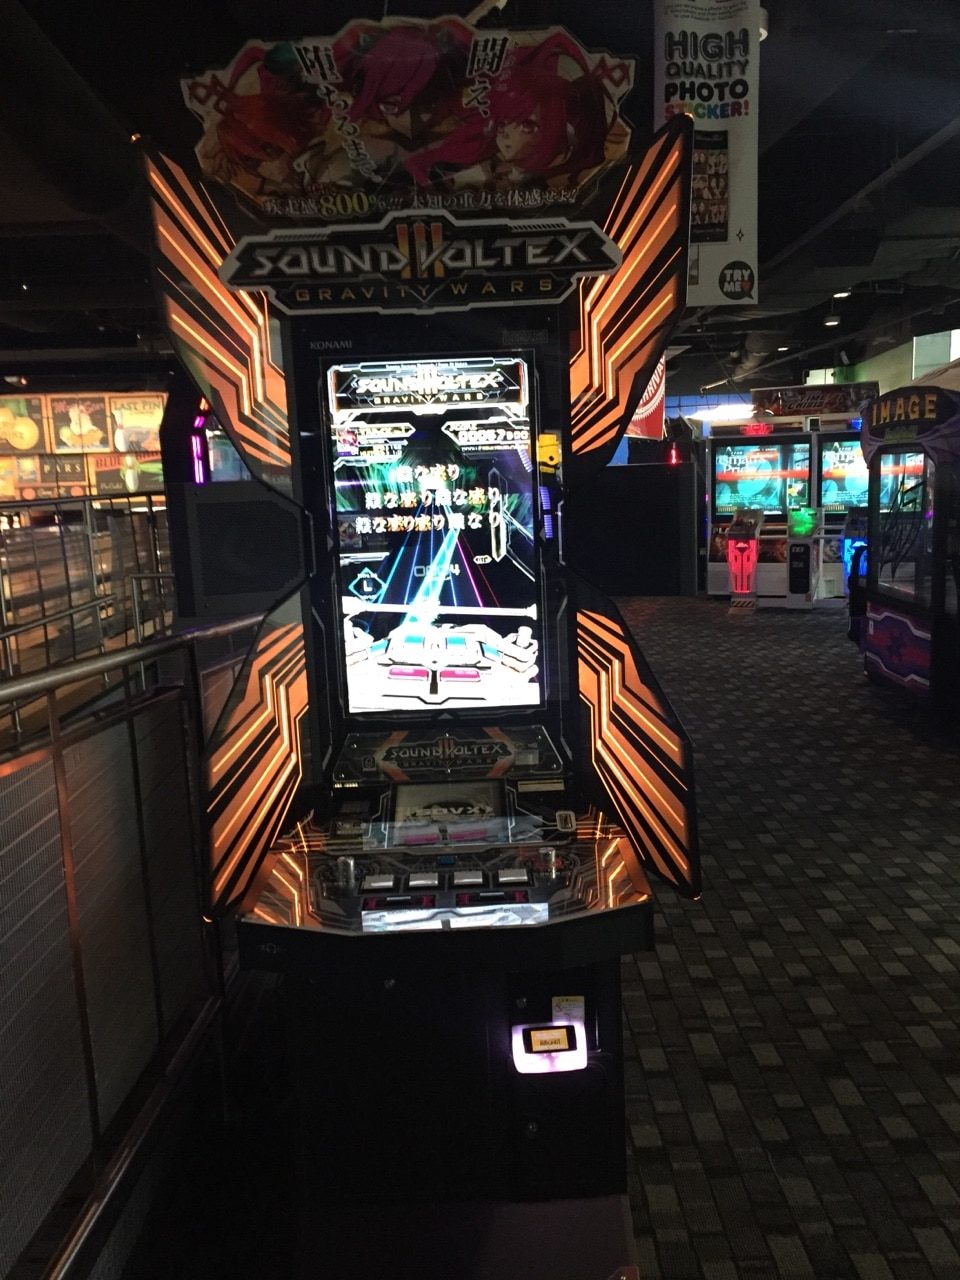 Mesin Game Arcade Music SoundVoltex III Gravity Wars